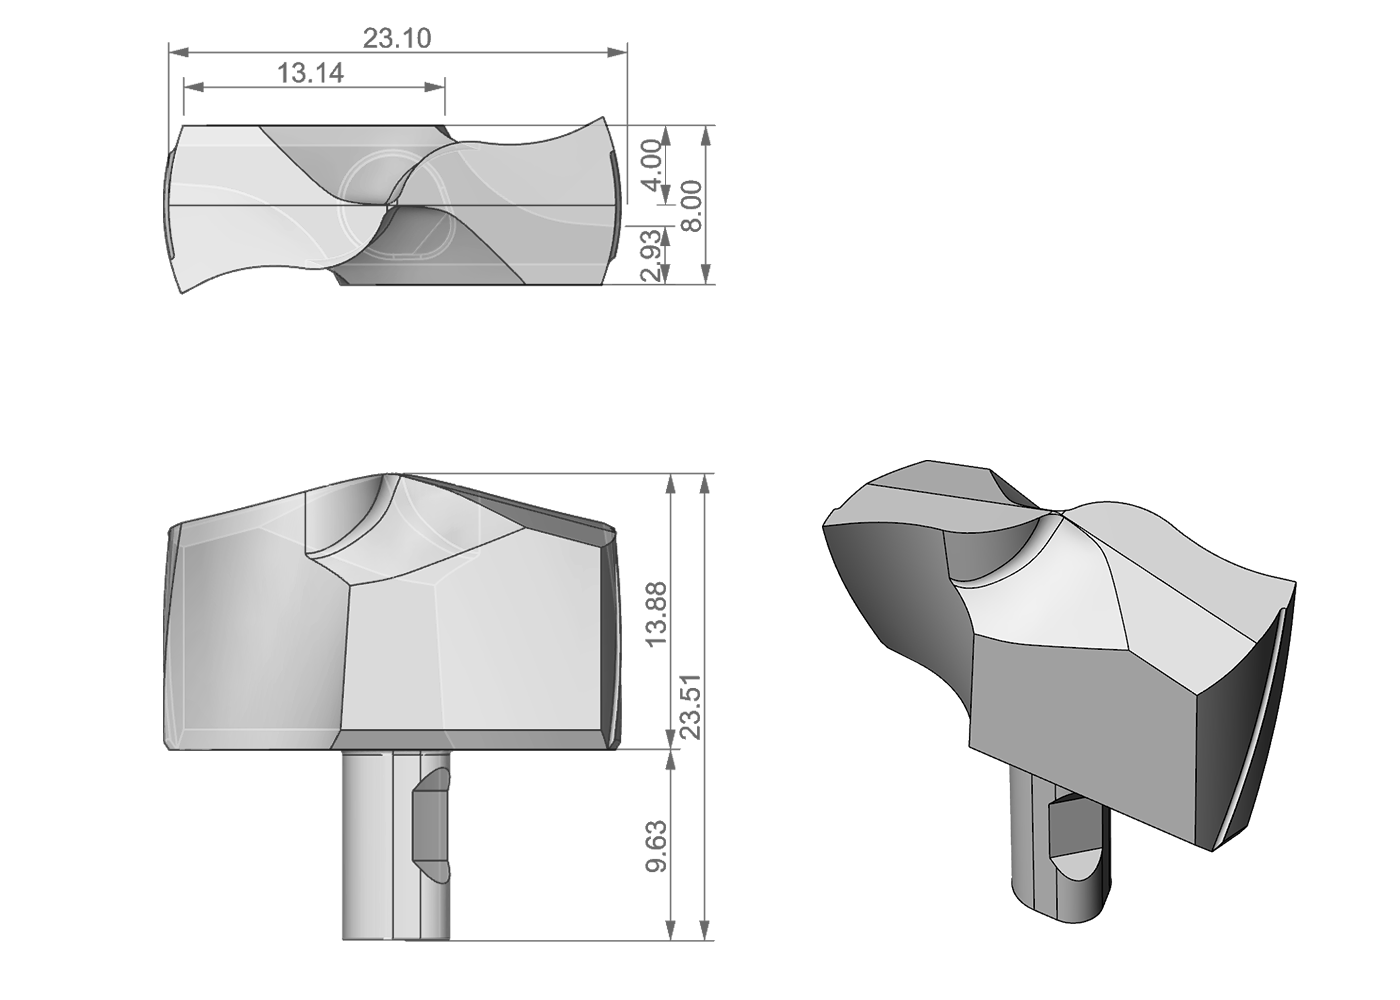 reverse engineereing di inserto metallico